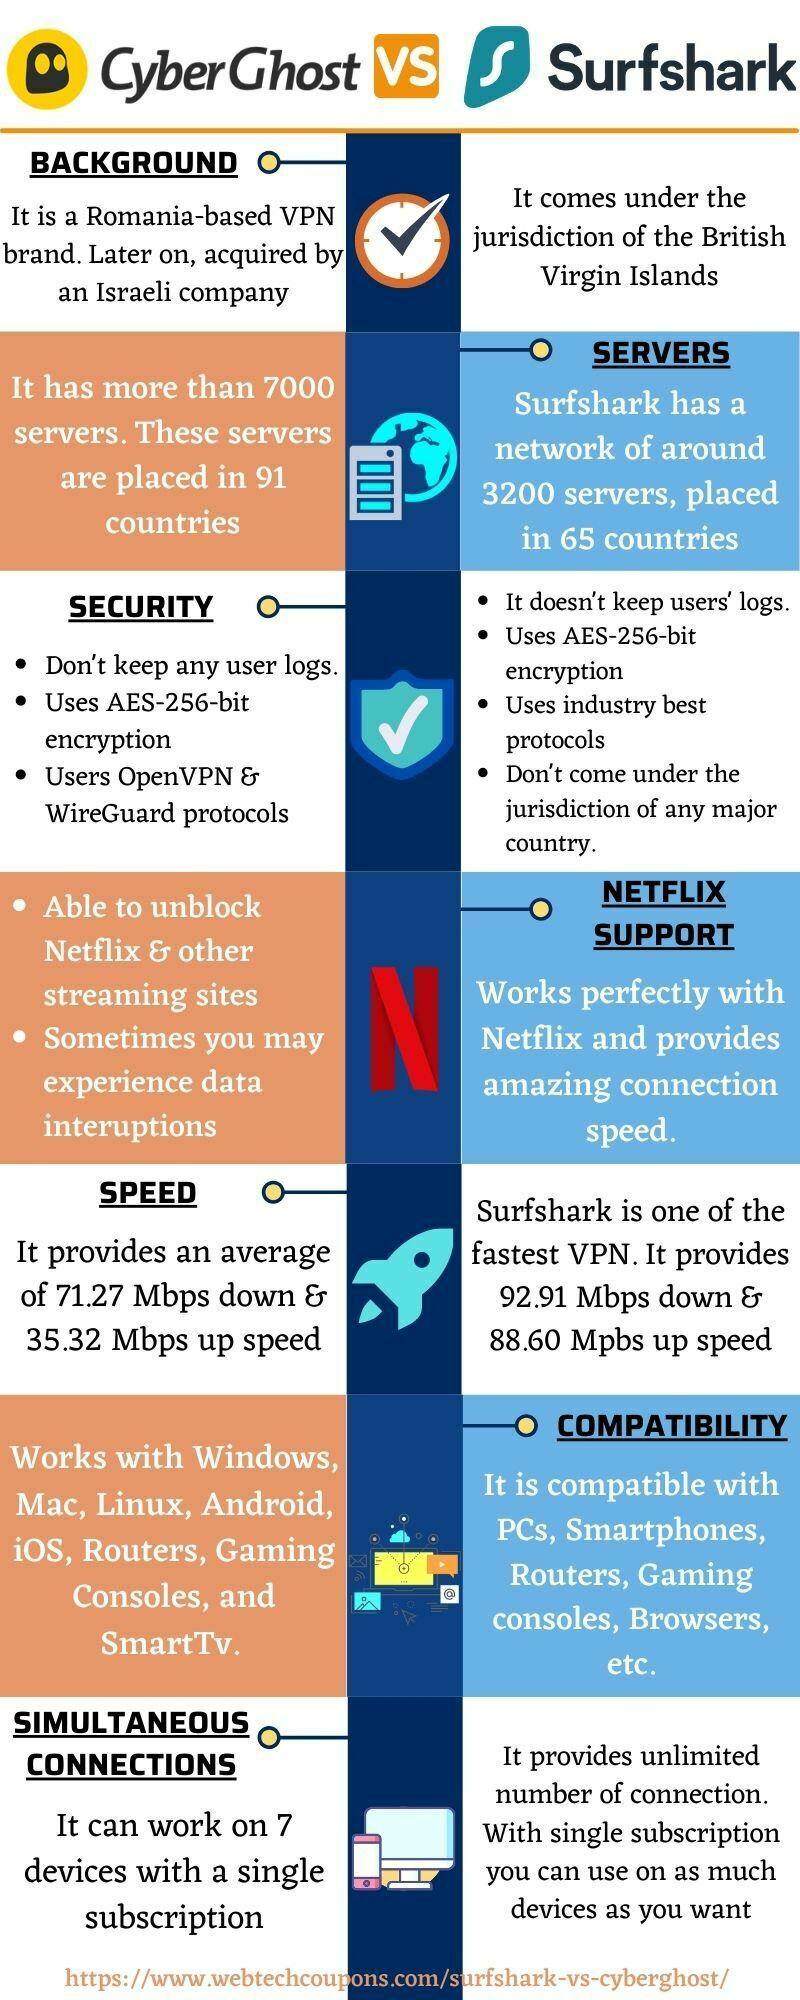 CyberGhost vs Surfshark www.webtechcoupons.com